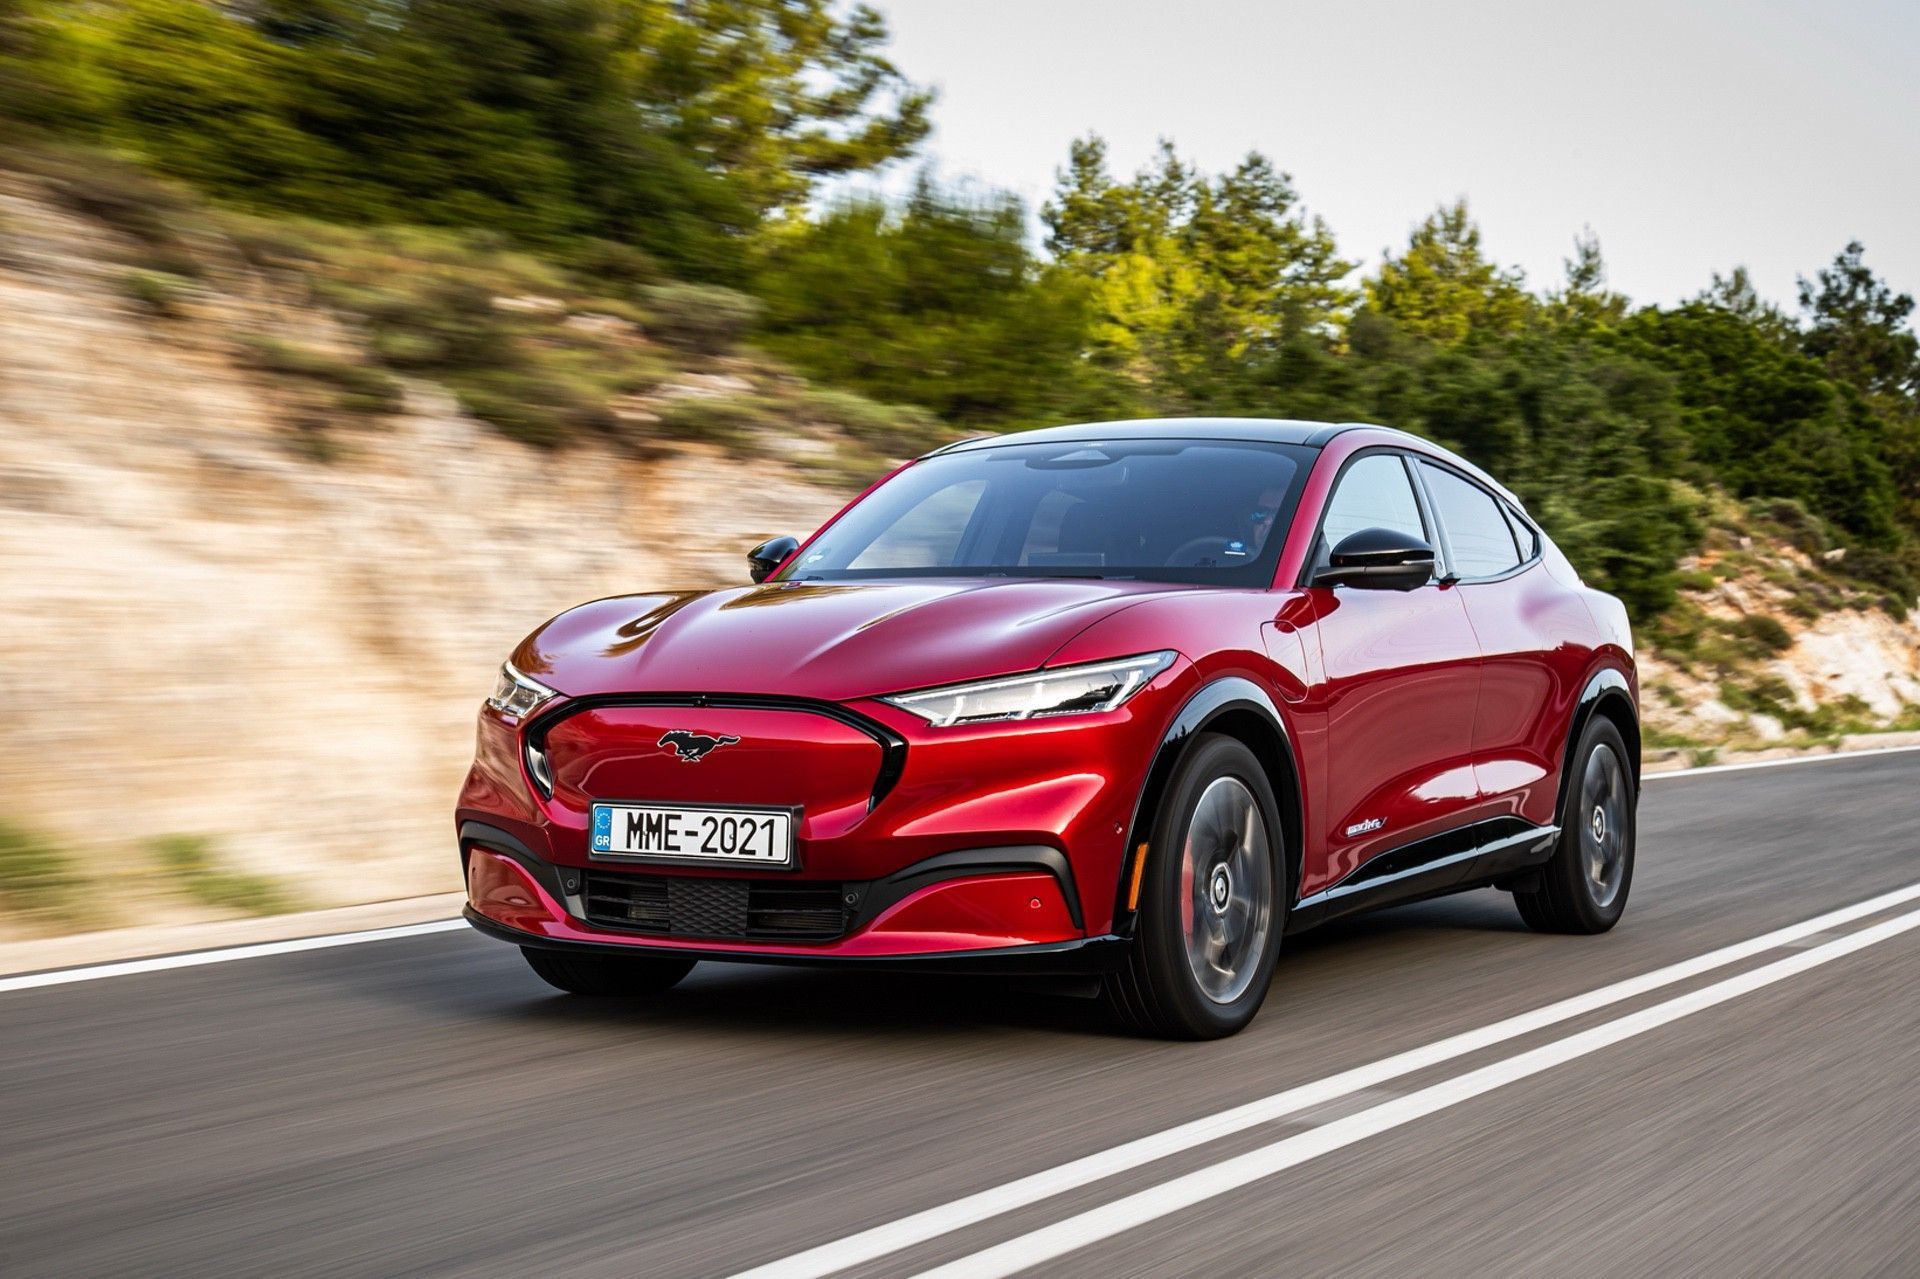 Ford_Mustang_Mach-E_greek_presskit-0134